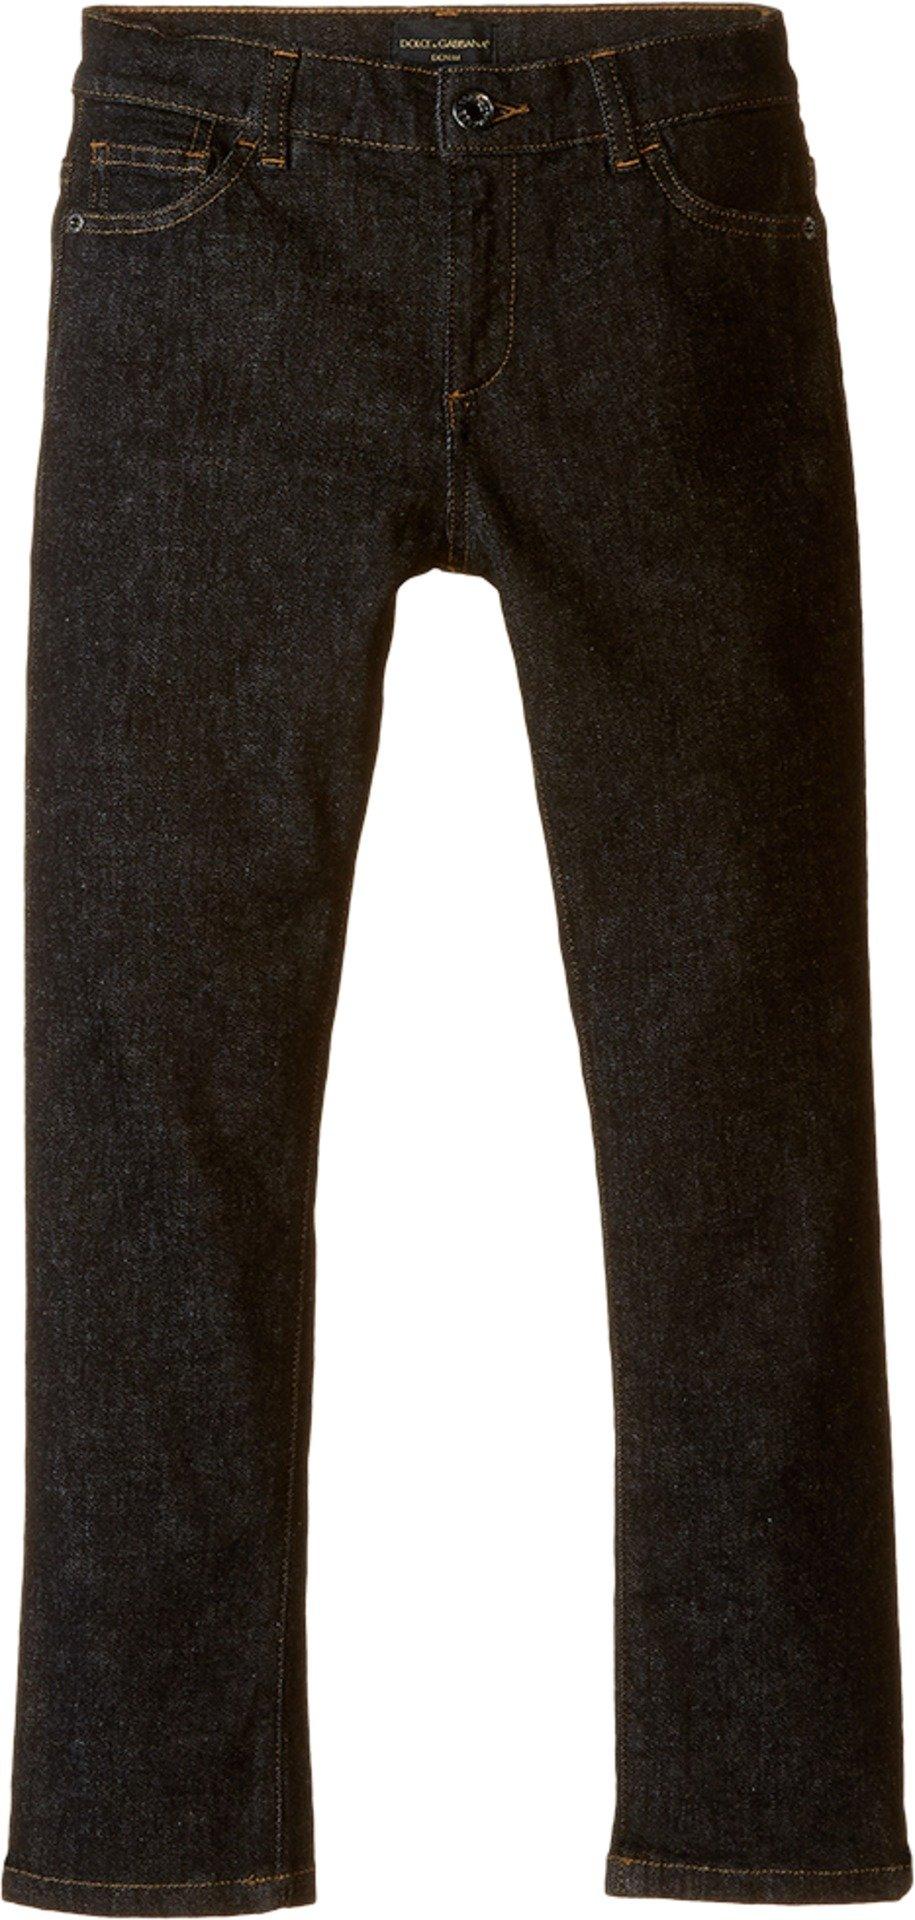 Dolce & Gabbana Kids Boys' Back To School Black Jeans, Charcoal Denim, 8 (Big Kids) X One Size